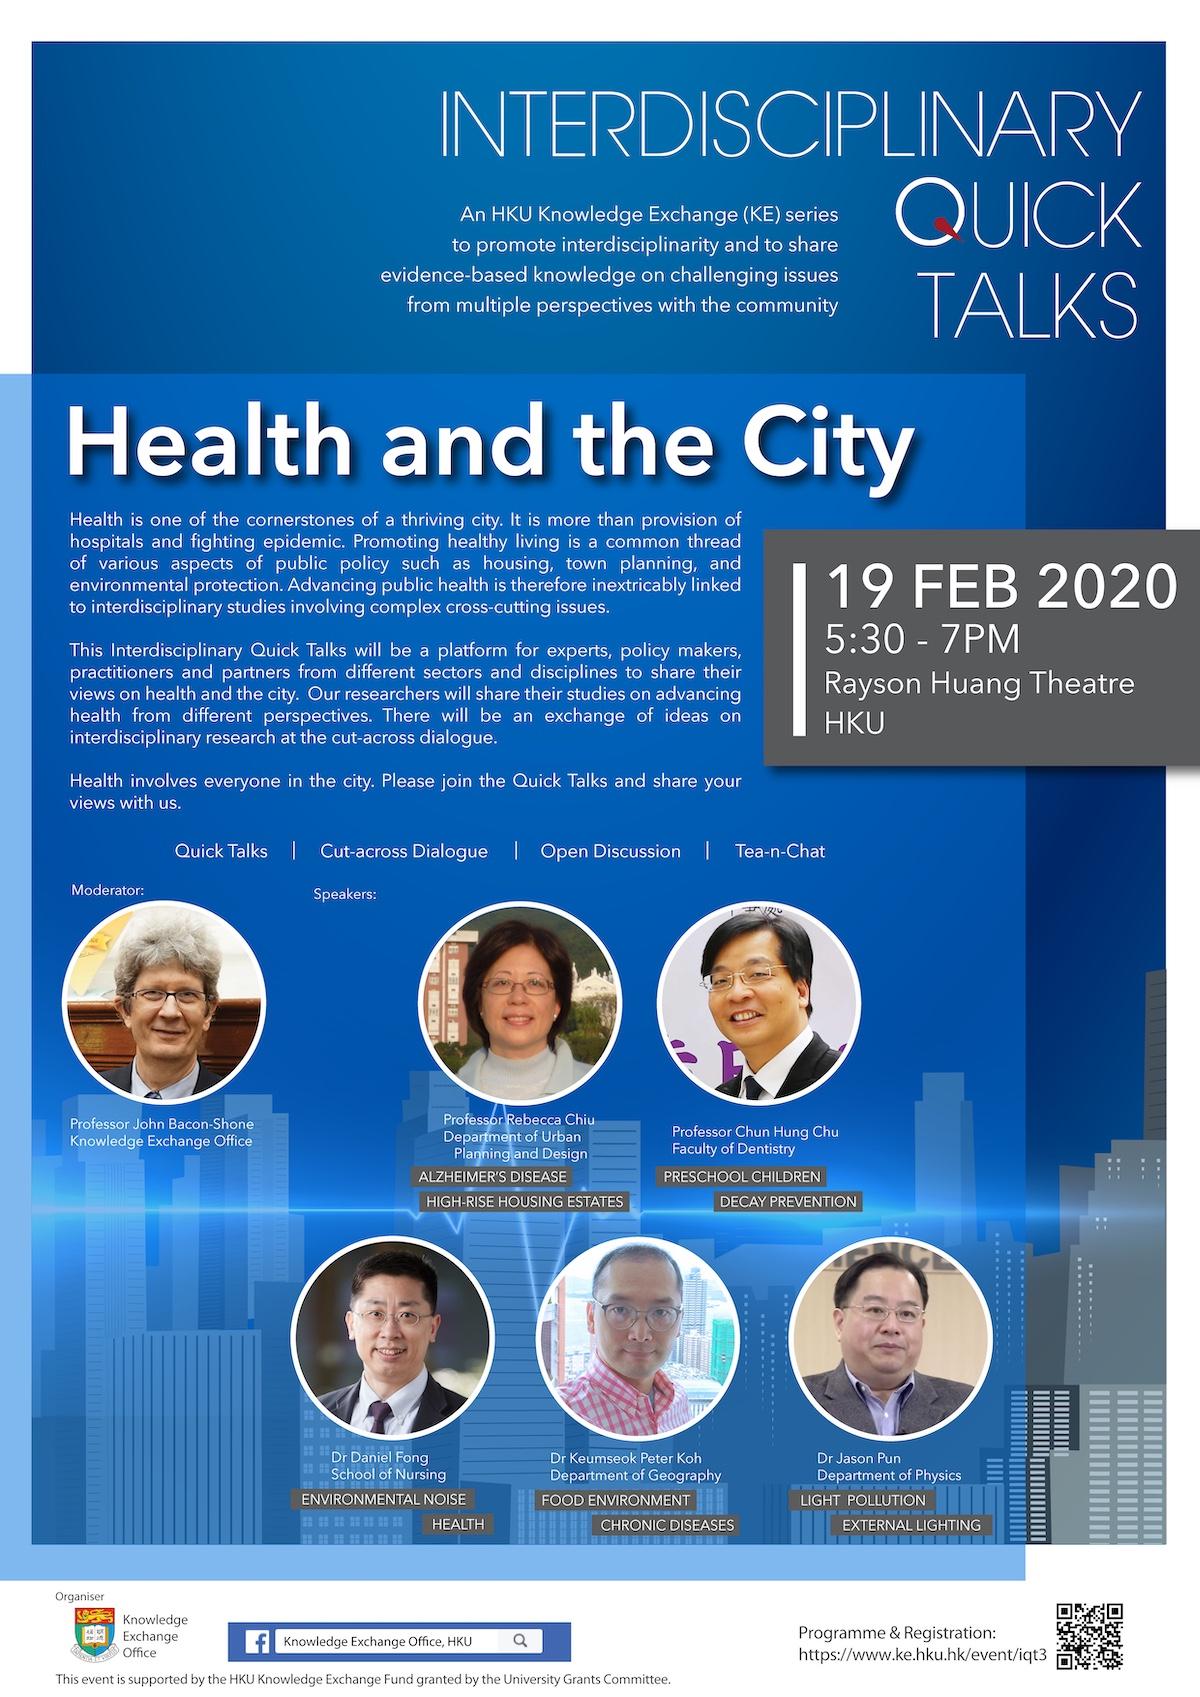 Interdisciplinary Quick Talks: Health and the City